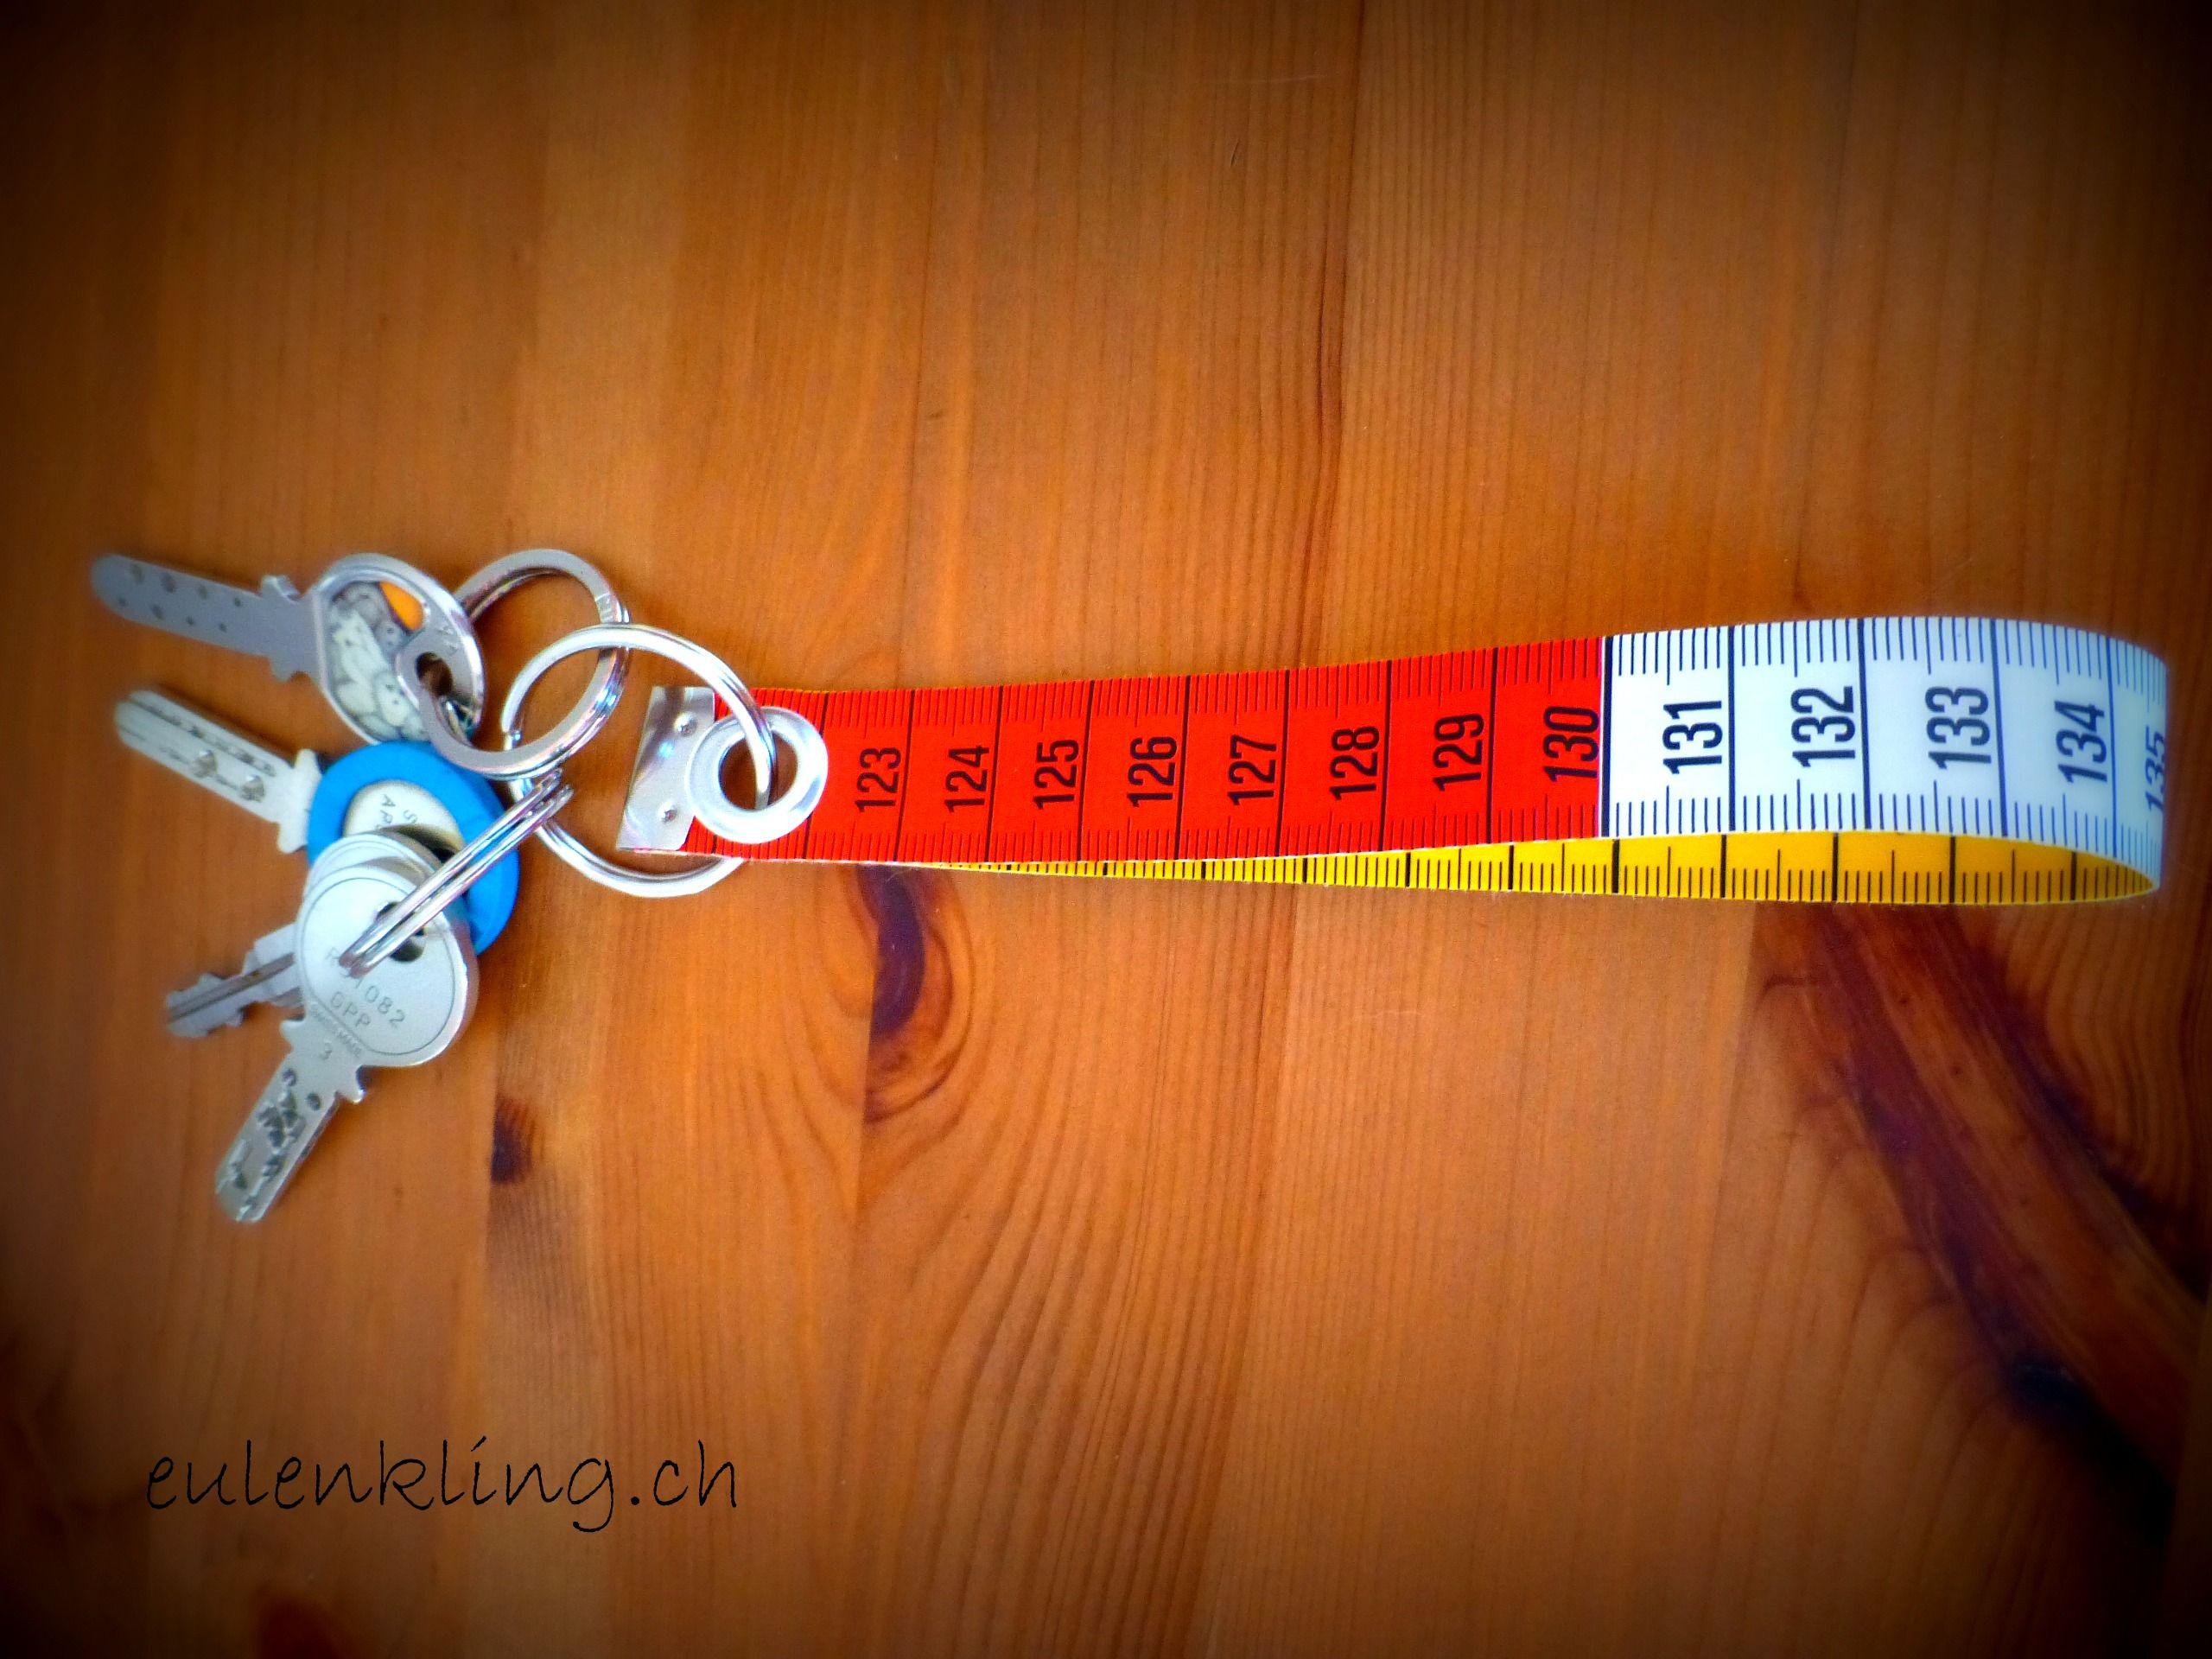 Schlüsselanhänger aus einem Rest Centimeterband http://eulenkling.blogspot.ch/2014/02/minirums-schlusselanhanger-fur.html